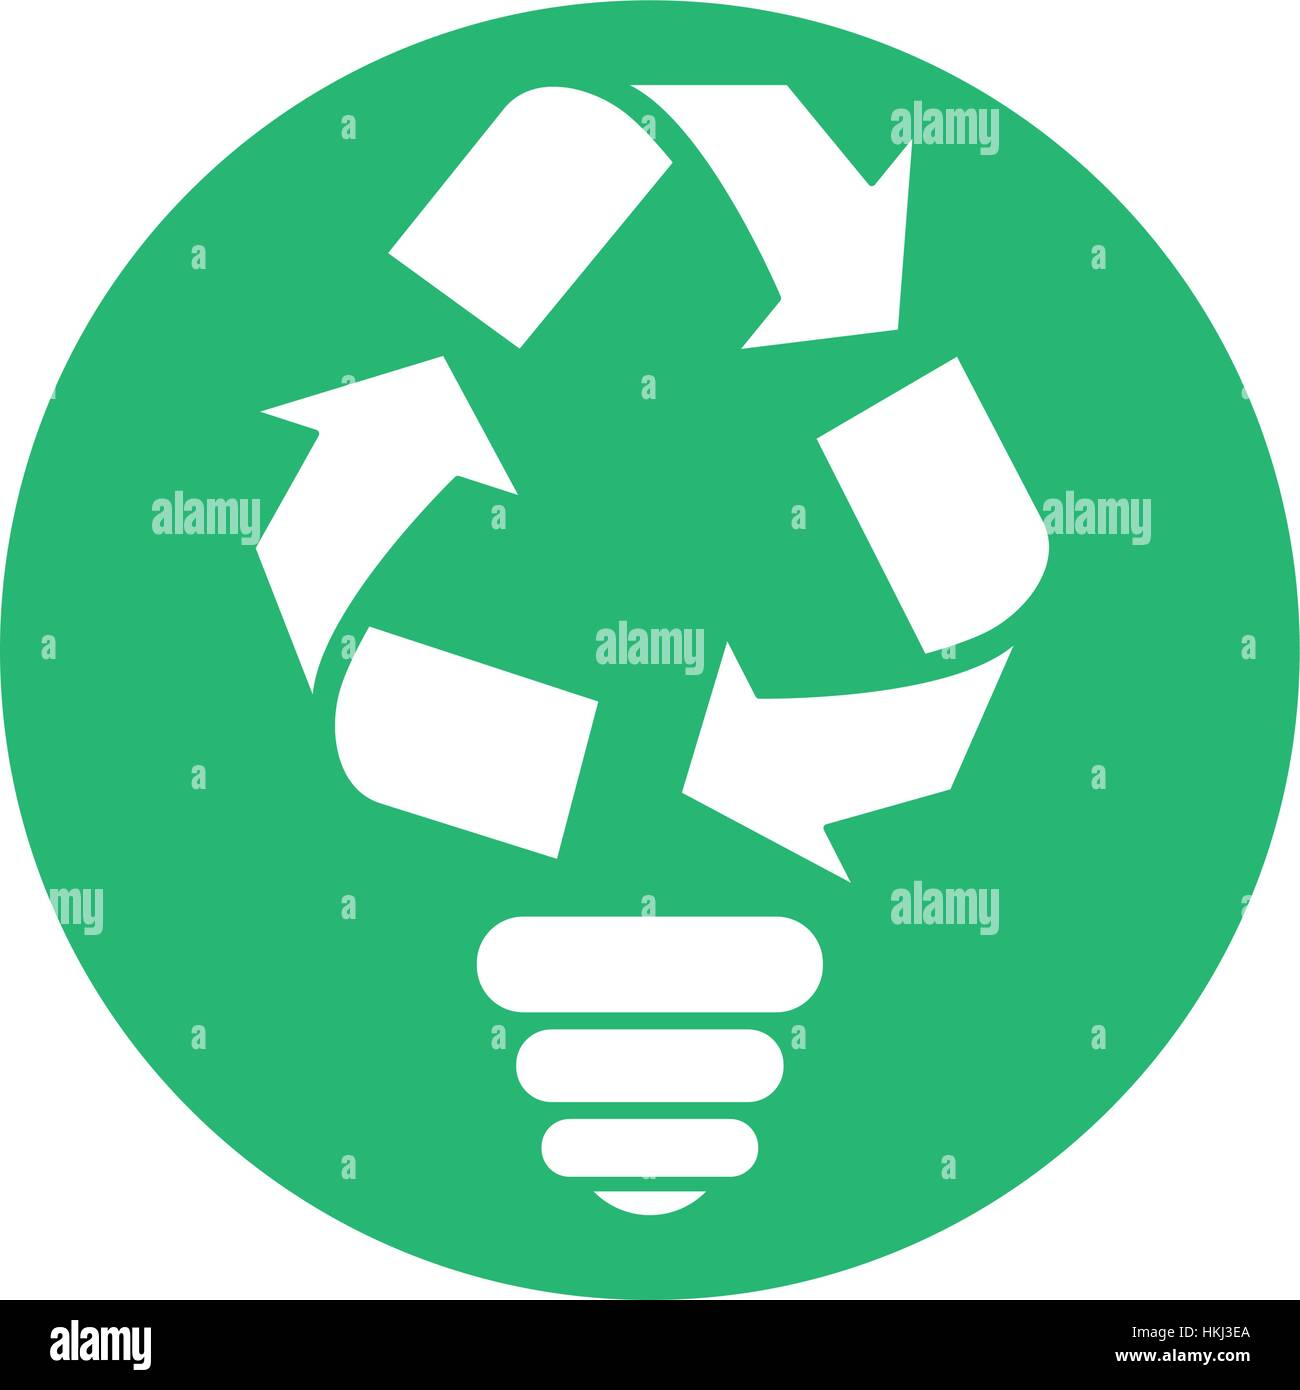 Figure bulb environmental care icon image, vector illustration - Stock Image